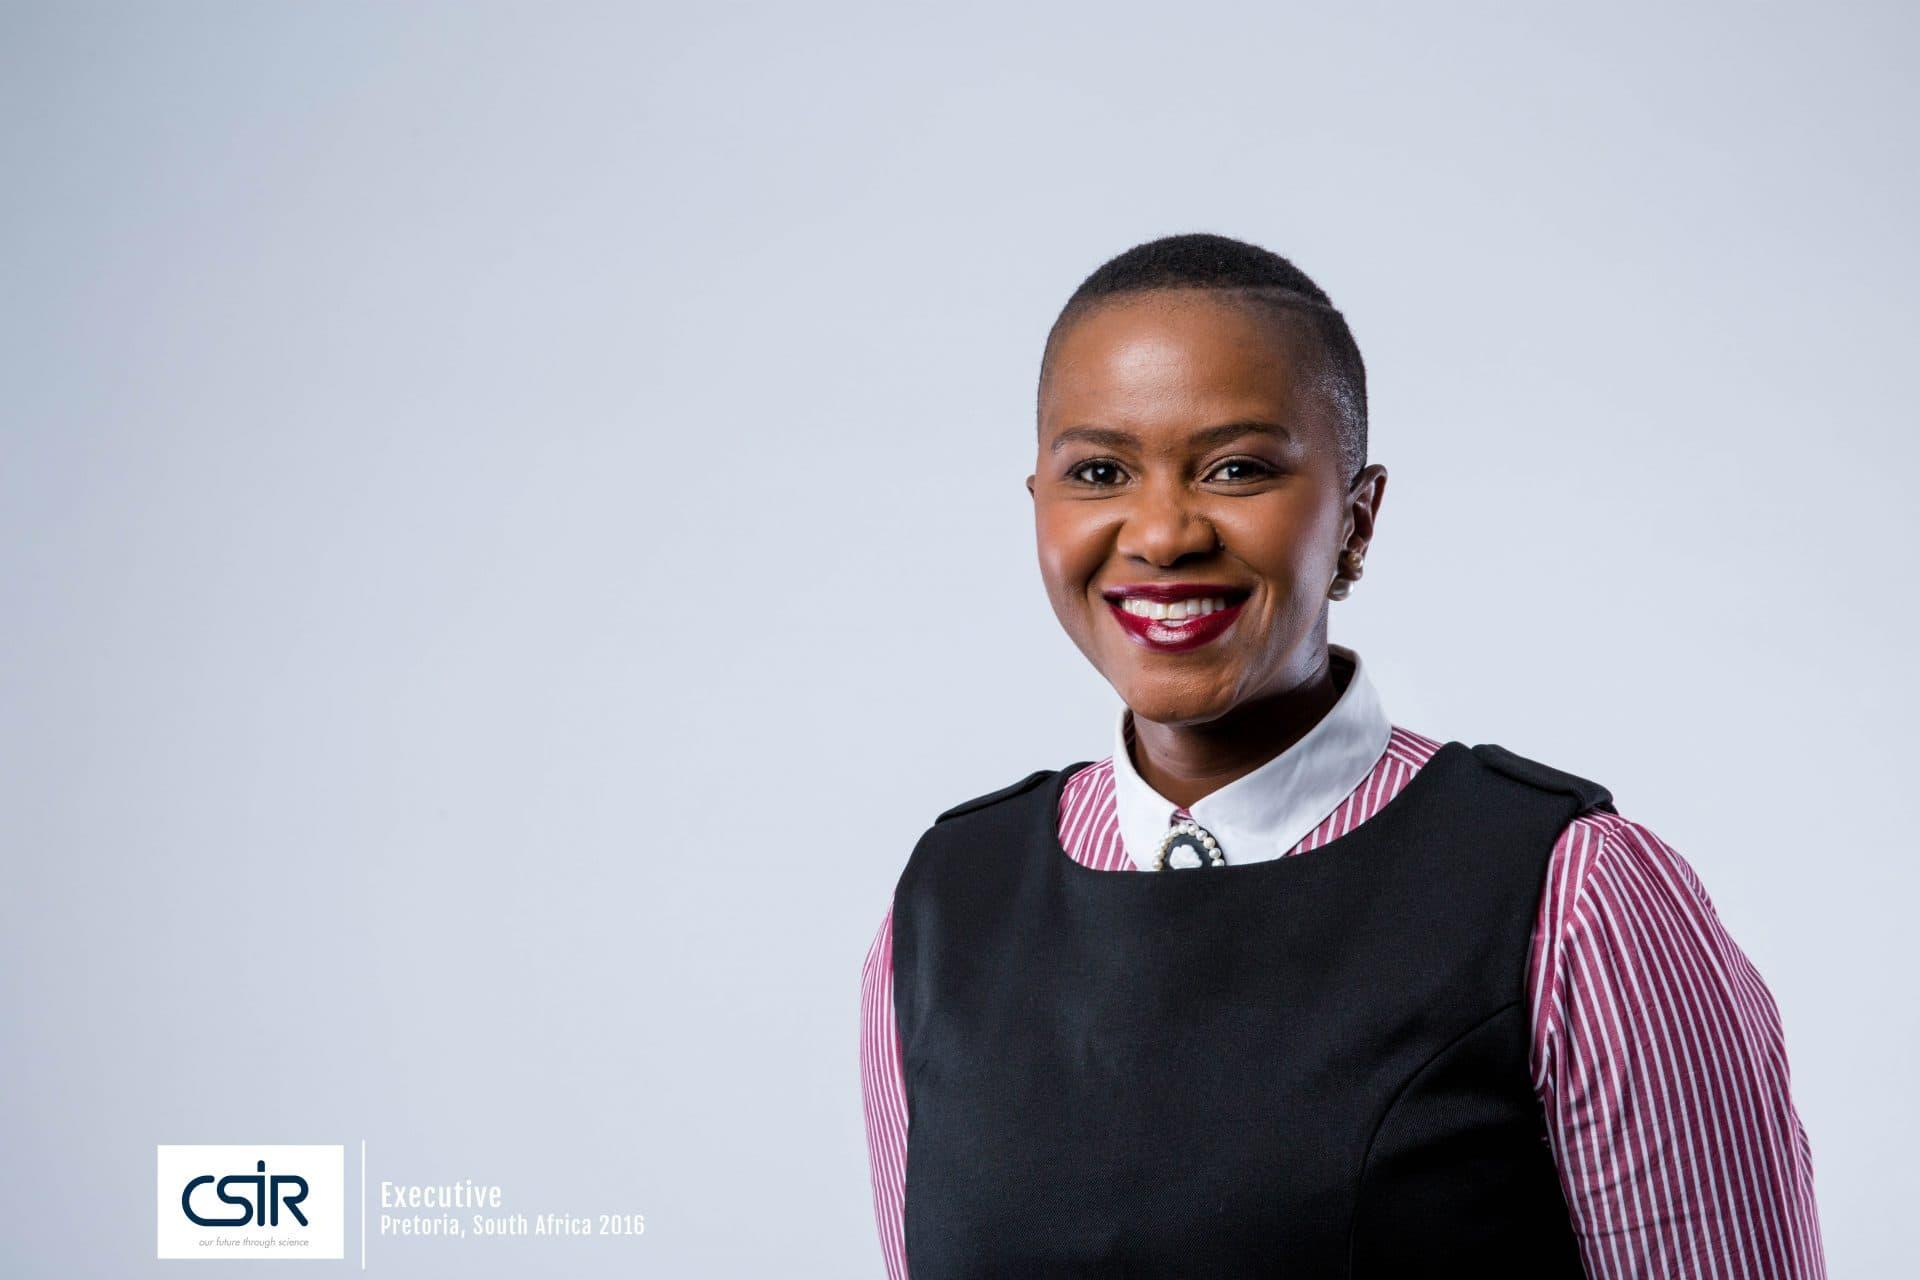 Portrait of  black women executive